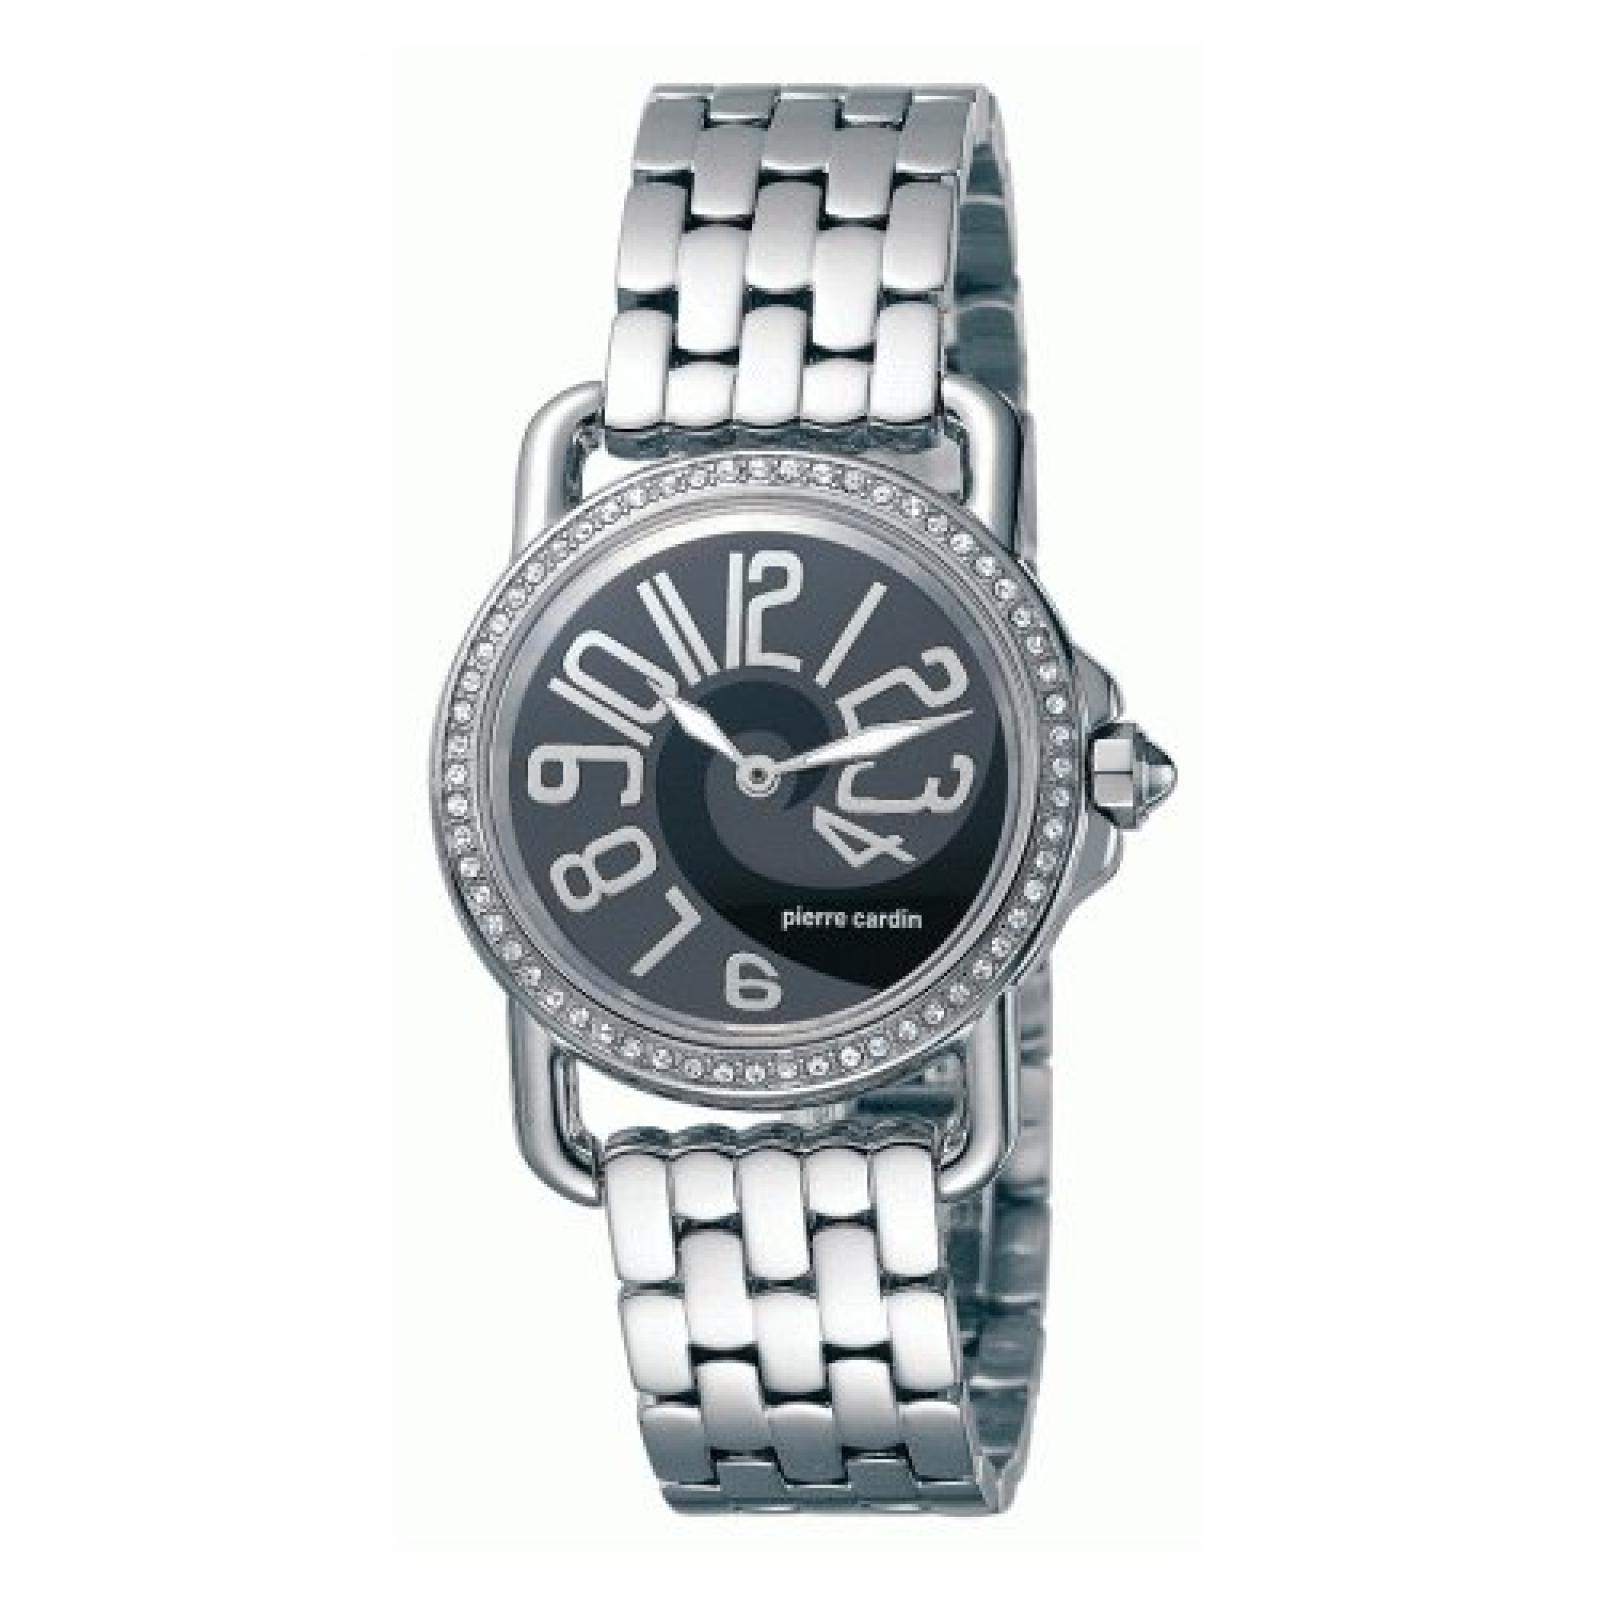 Pierre Cardin Damen-Armbanduhr Revue Madame PC068782011